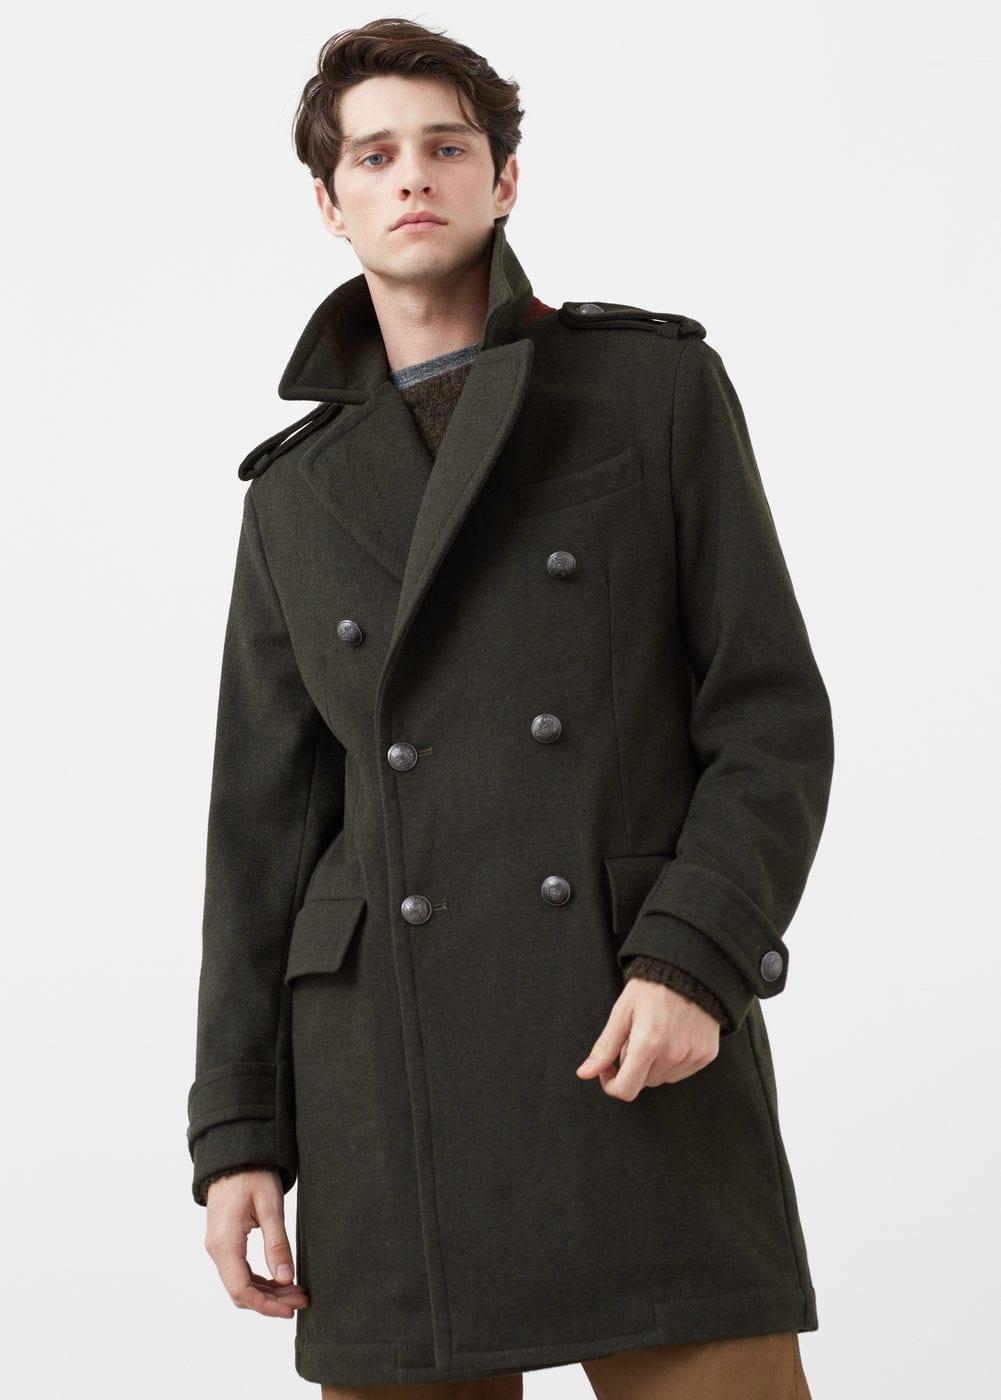 df4e2565c38 Amazon. Haggar Mens Bedford Peacoat. Buy. Military Style Wool Coat - SeenIt